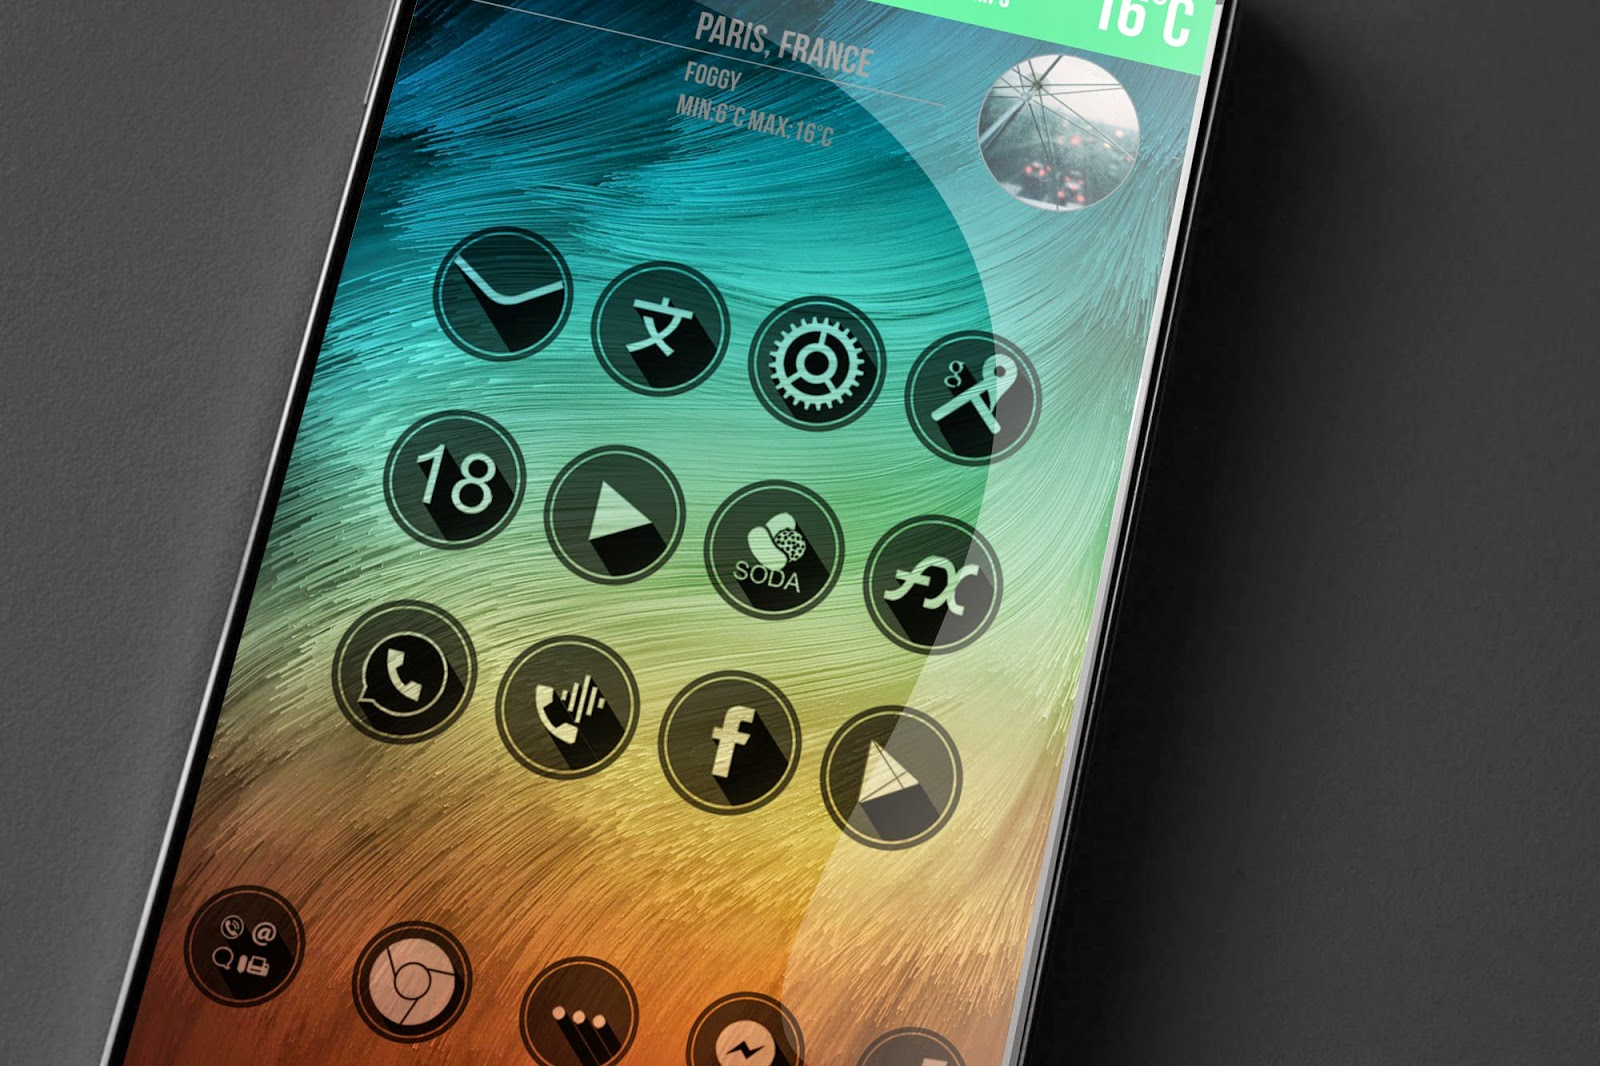 free go launcher icons